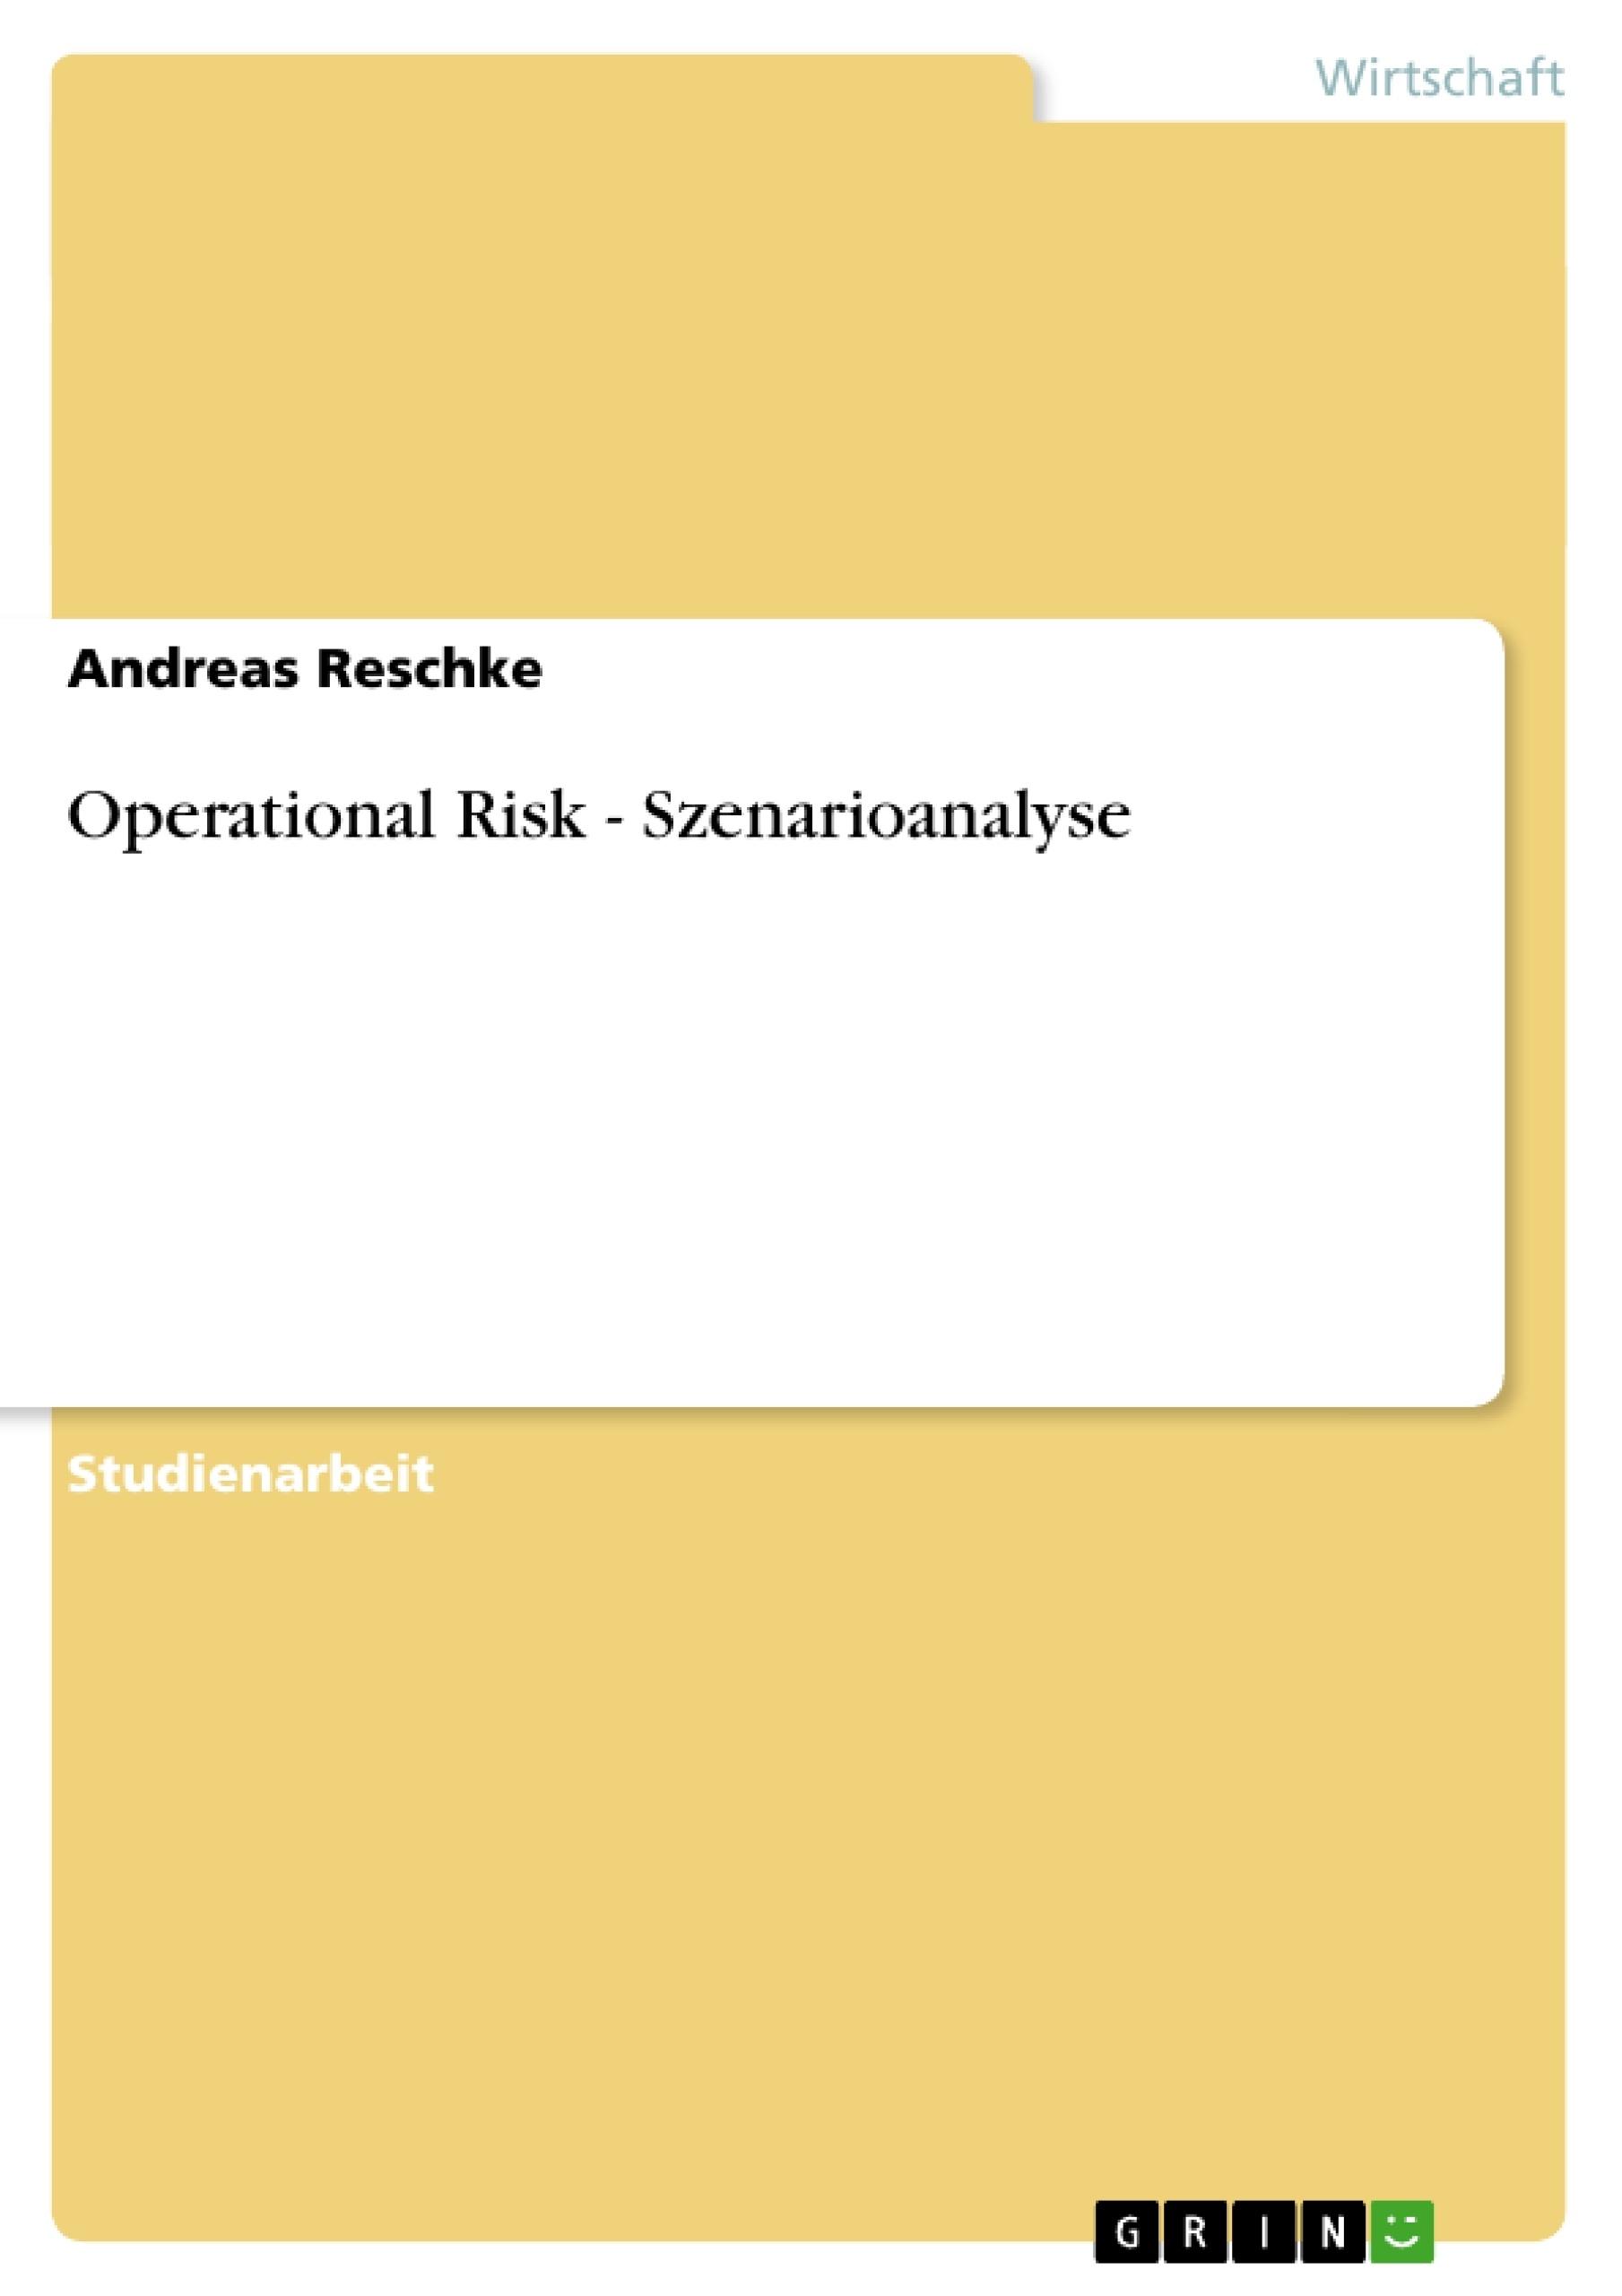 Titel: Operational Risk - Szenarioanalyse